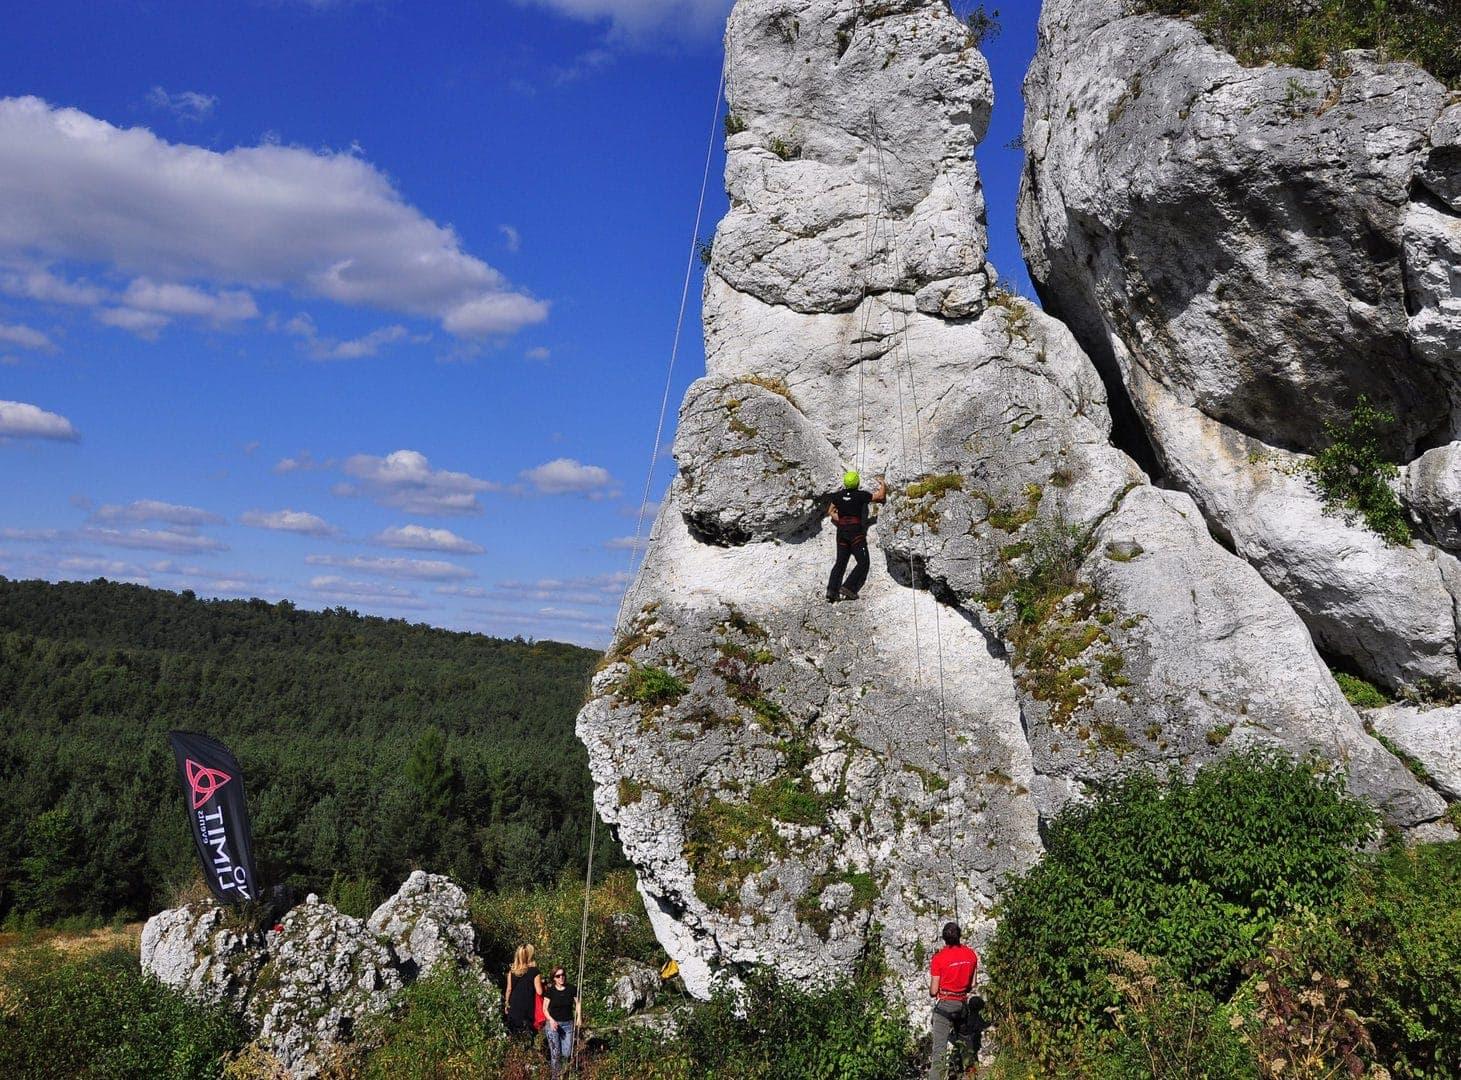 Krakow aktivrejse studietur alfa travel klatring